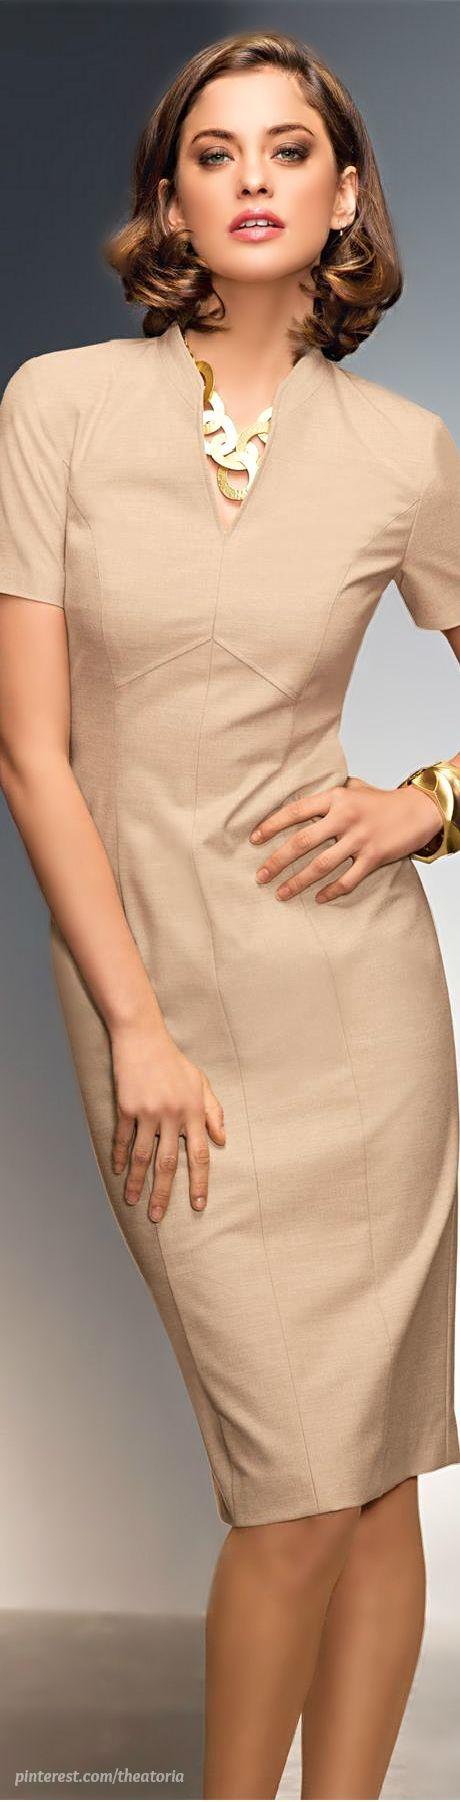 beige dress @roressclothes closet ideas women fashion outfit clothing style Madeleine: